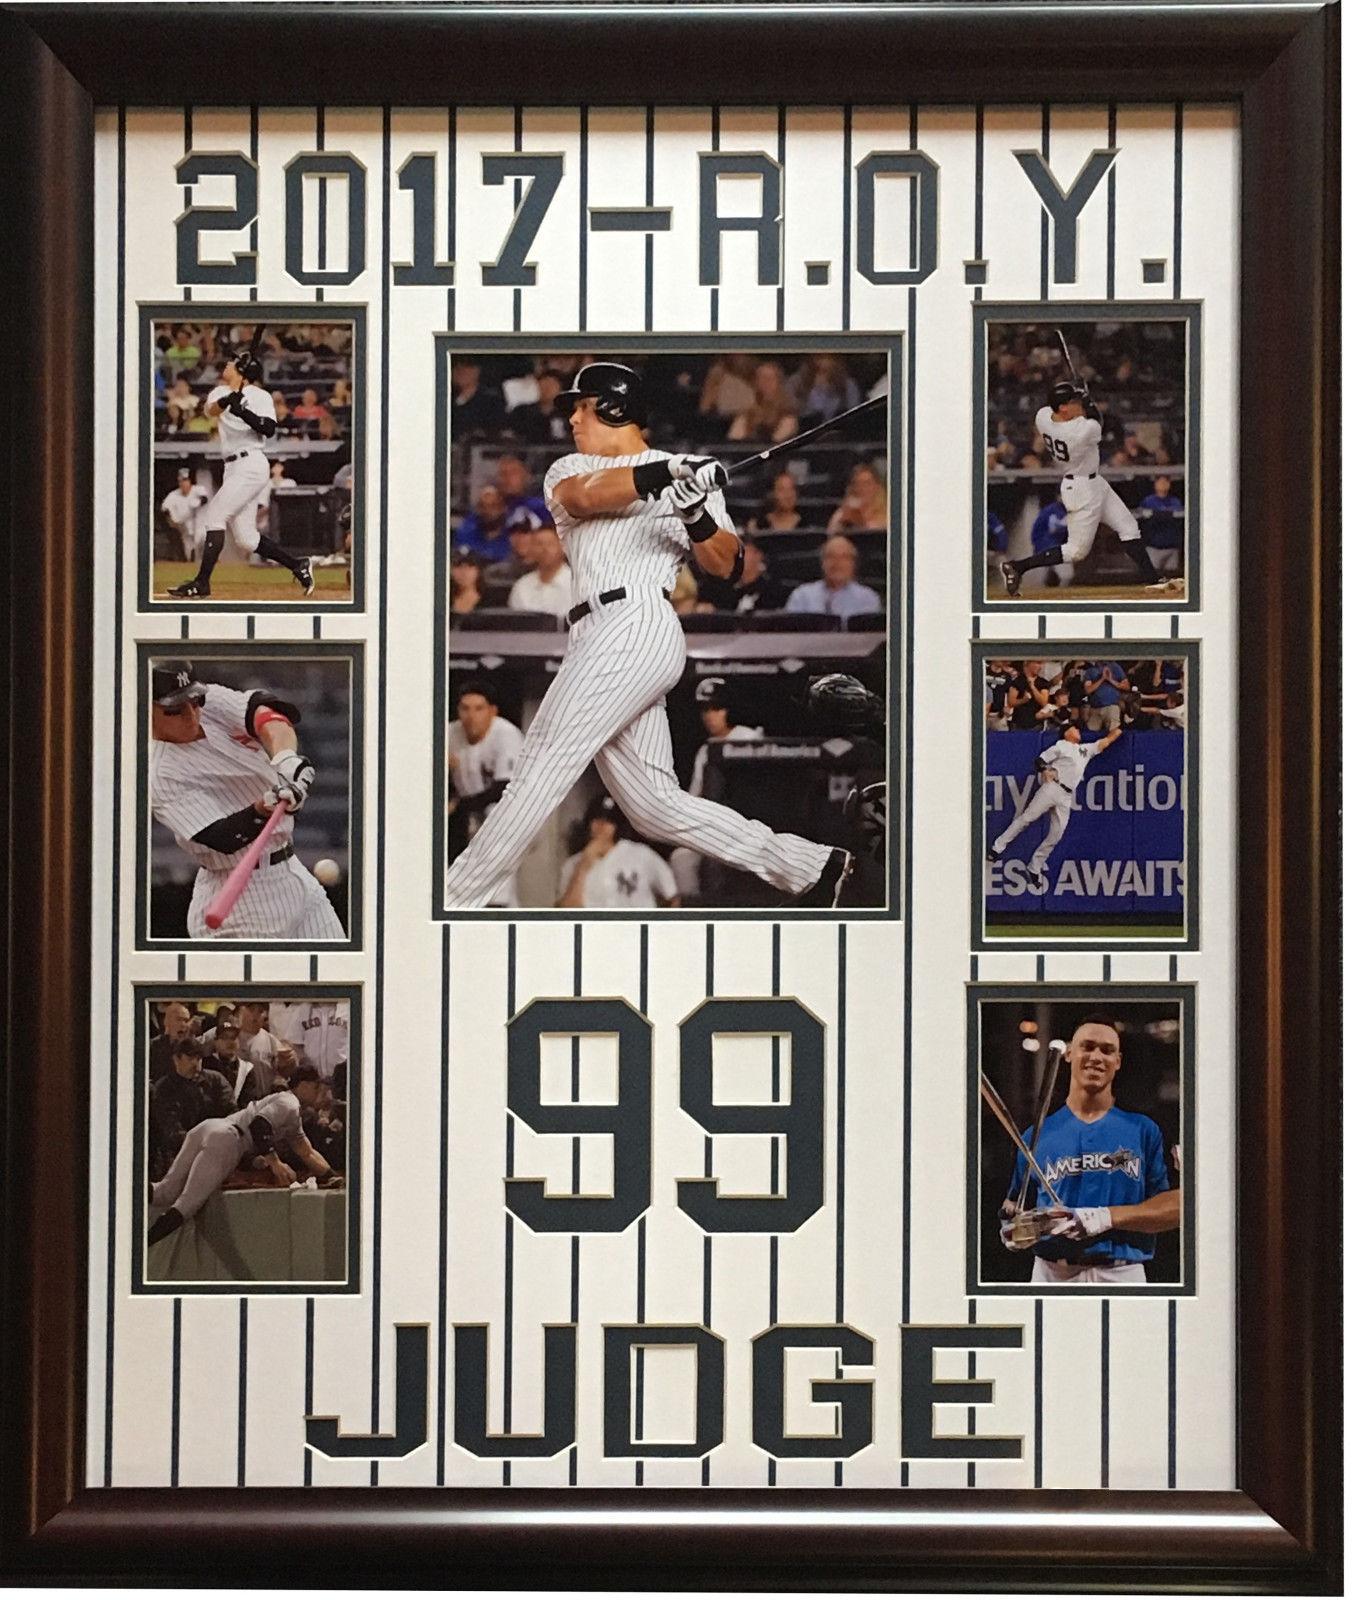 Aaron Judge Yankees 2017 AL ROY #99 7 photo pinstripe collage framed